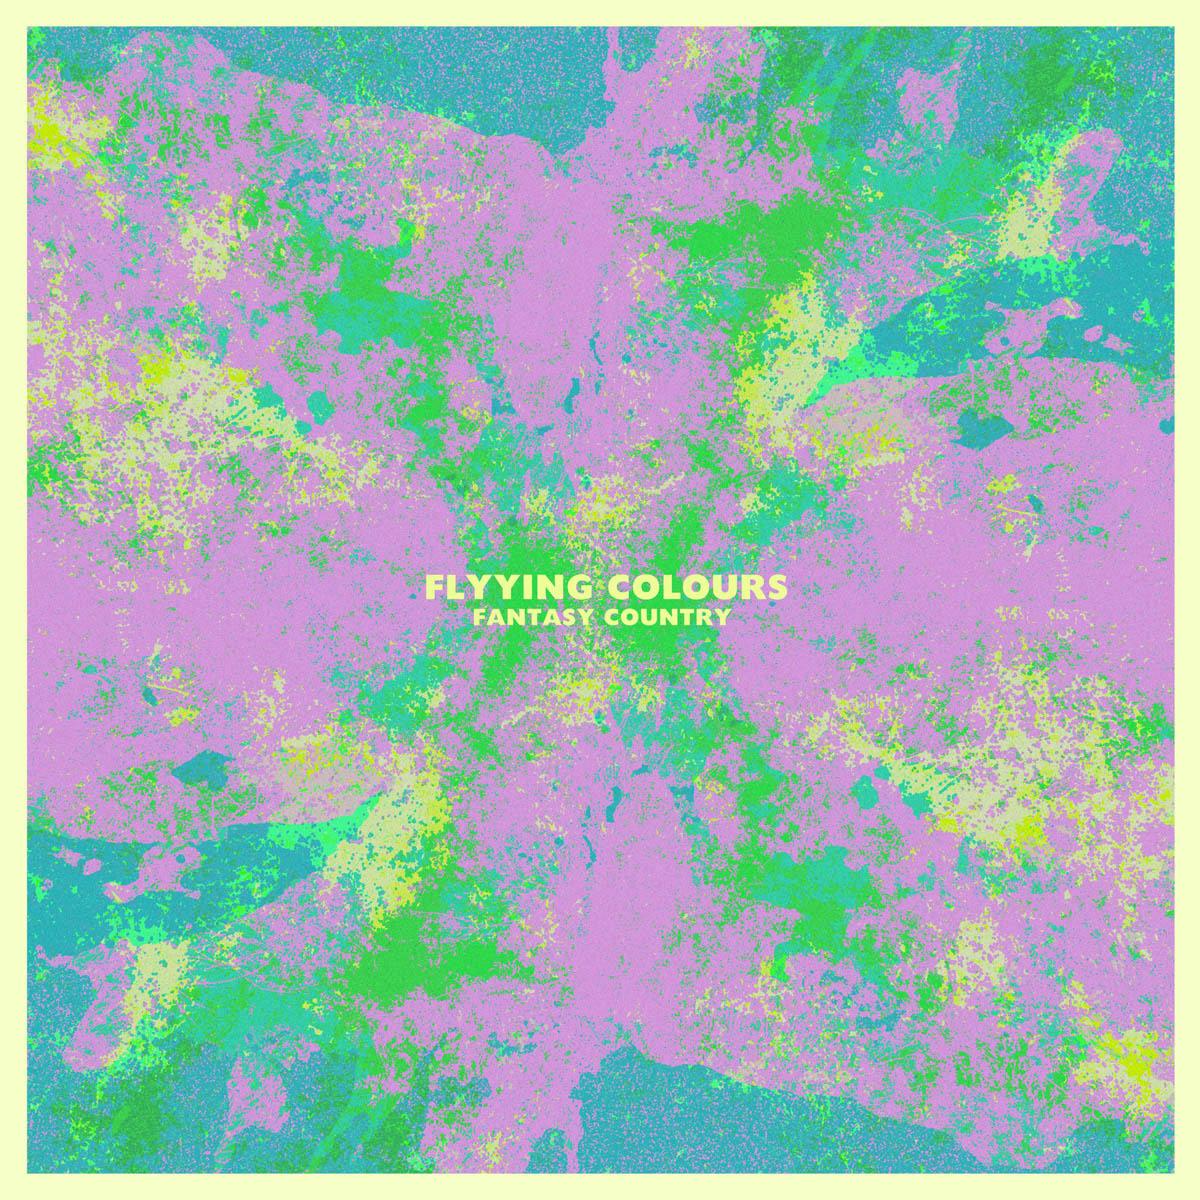 Flyying Colours Fantasy Country album review Australia